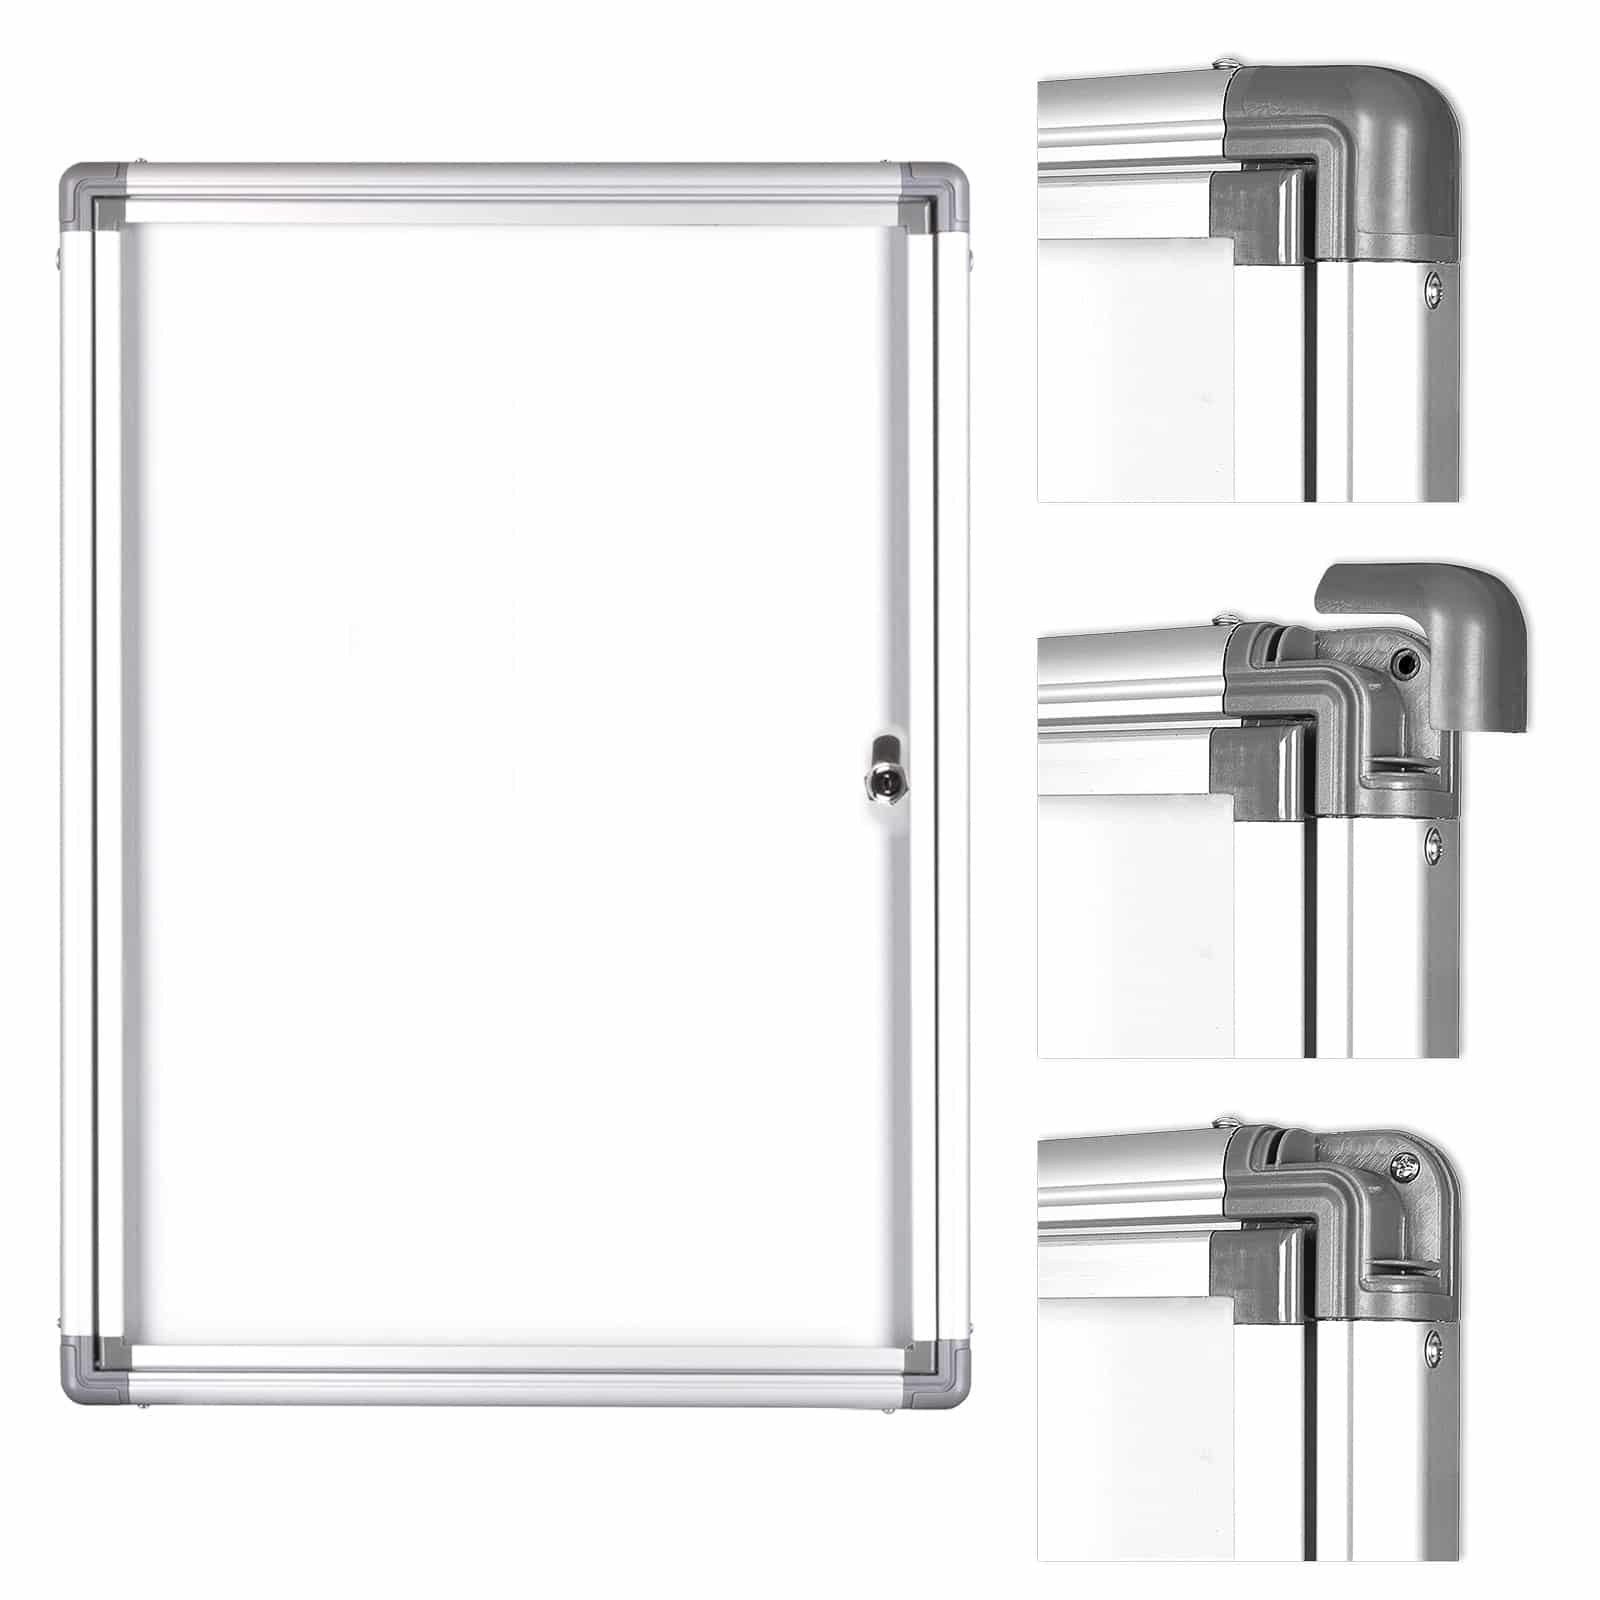 BüroMi Binnenvitrine / Mededelingenbord 9 Din A4 - incl. 36 magneten